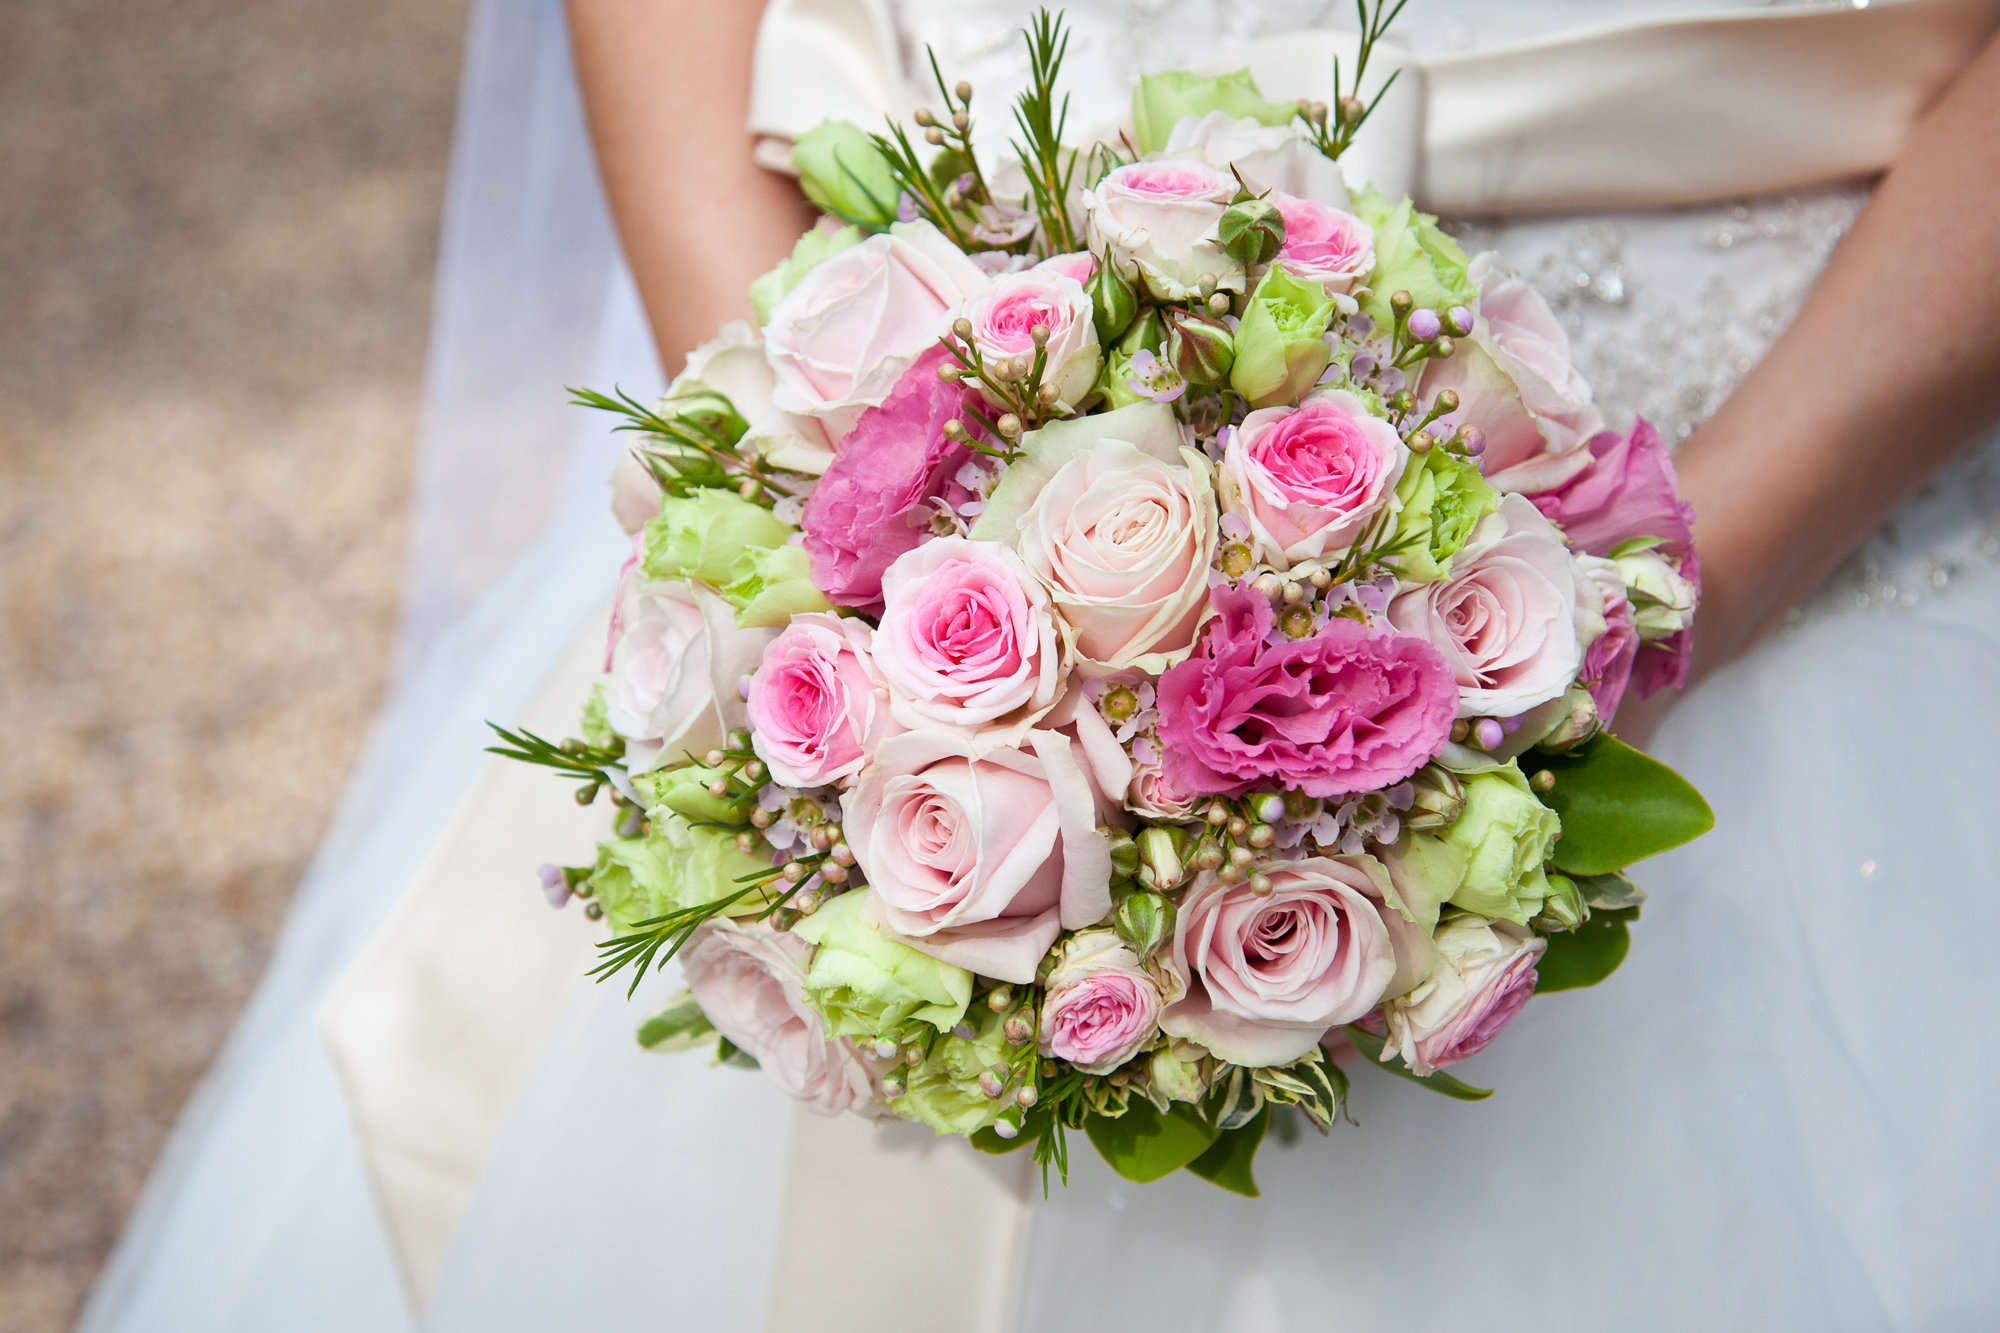 Bouquets, Posies, Corsages, Button Holes